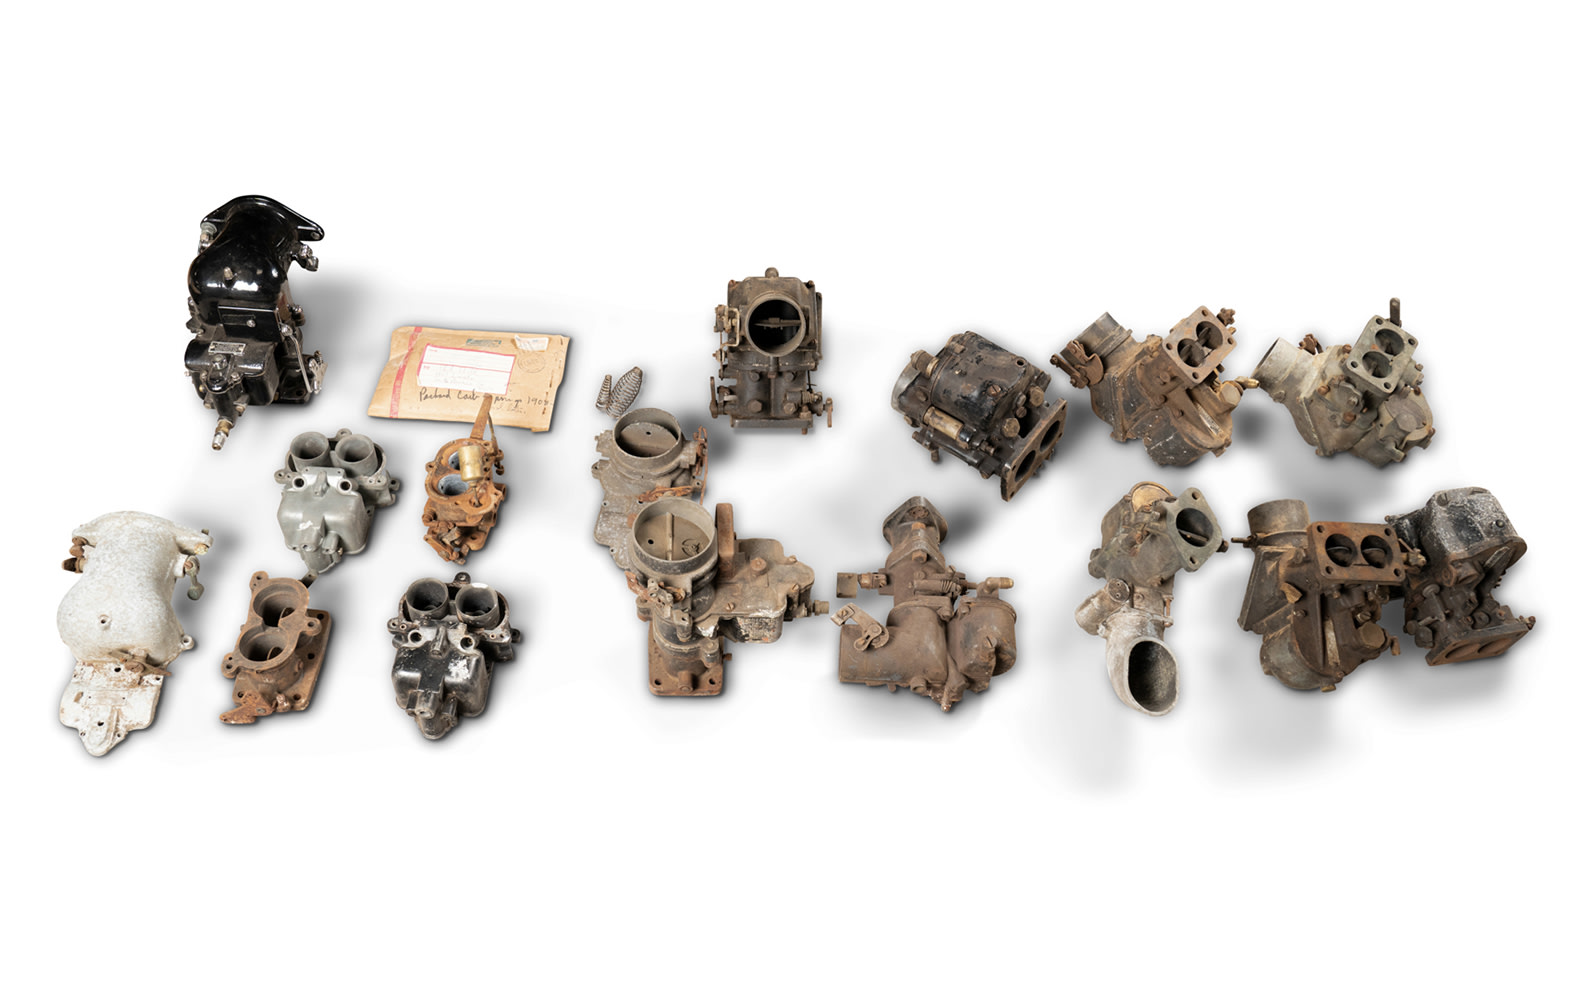 Prod/O21E - Phil Hill C 2021/C0095_Assorted Stromberg Carburetors/C0095_Stromberg_Carburetors_1_hxd40h